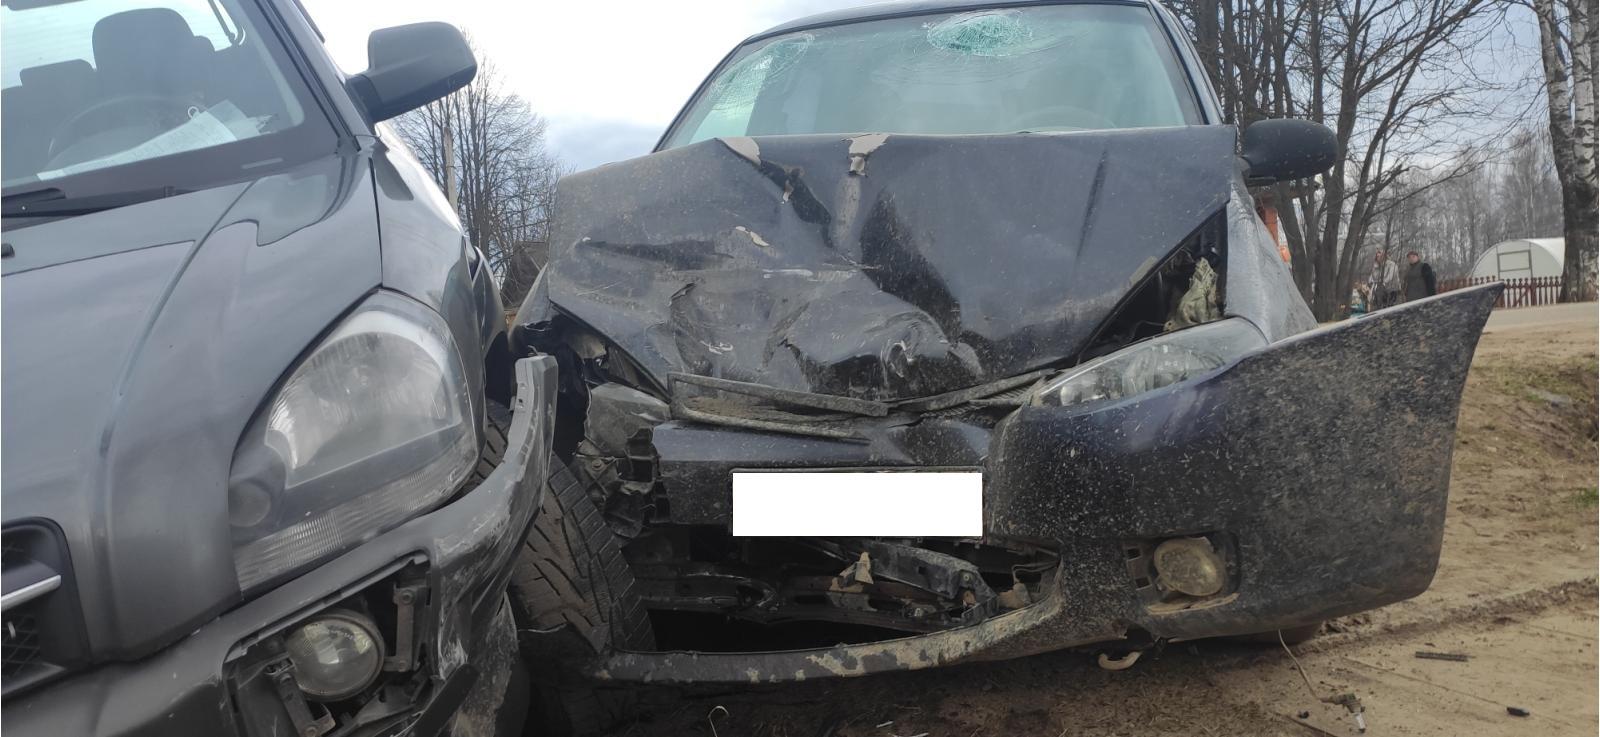 В ДТП на дороге райцентра пострадали три жителя Костромской области